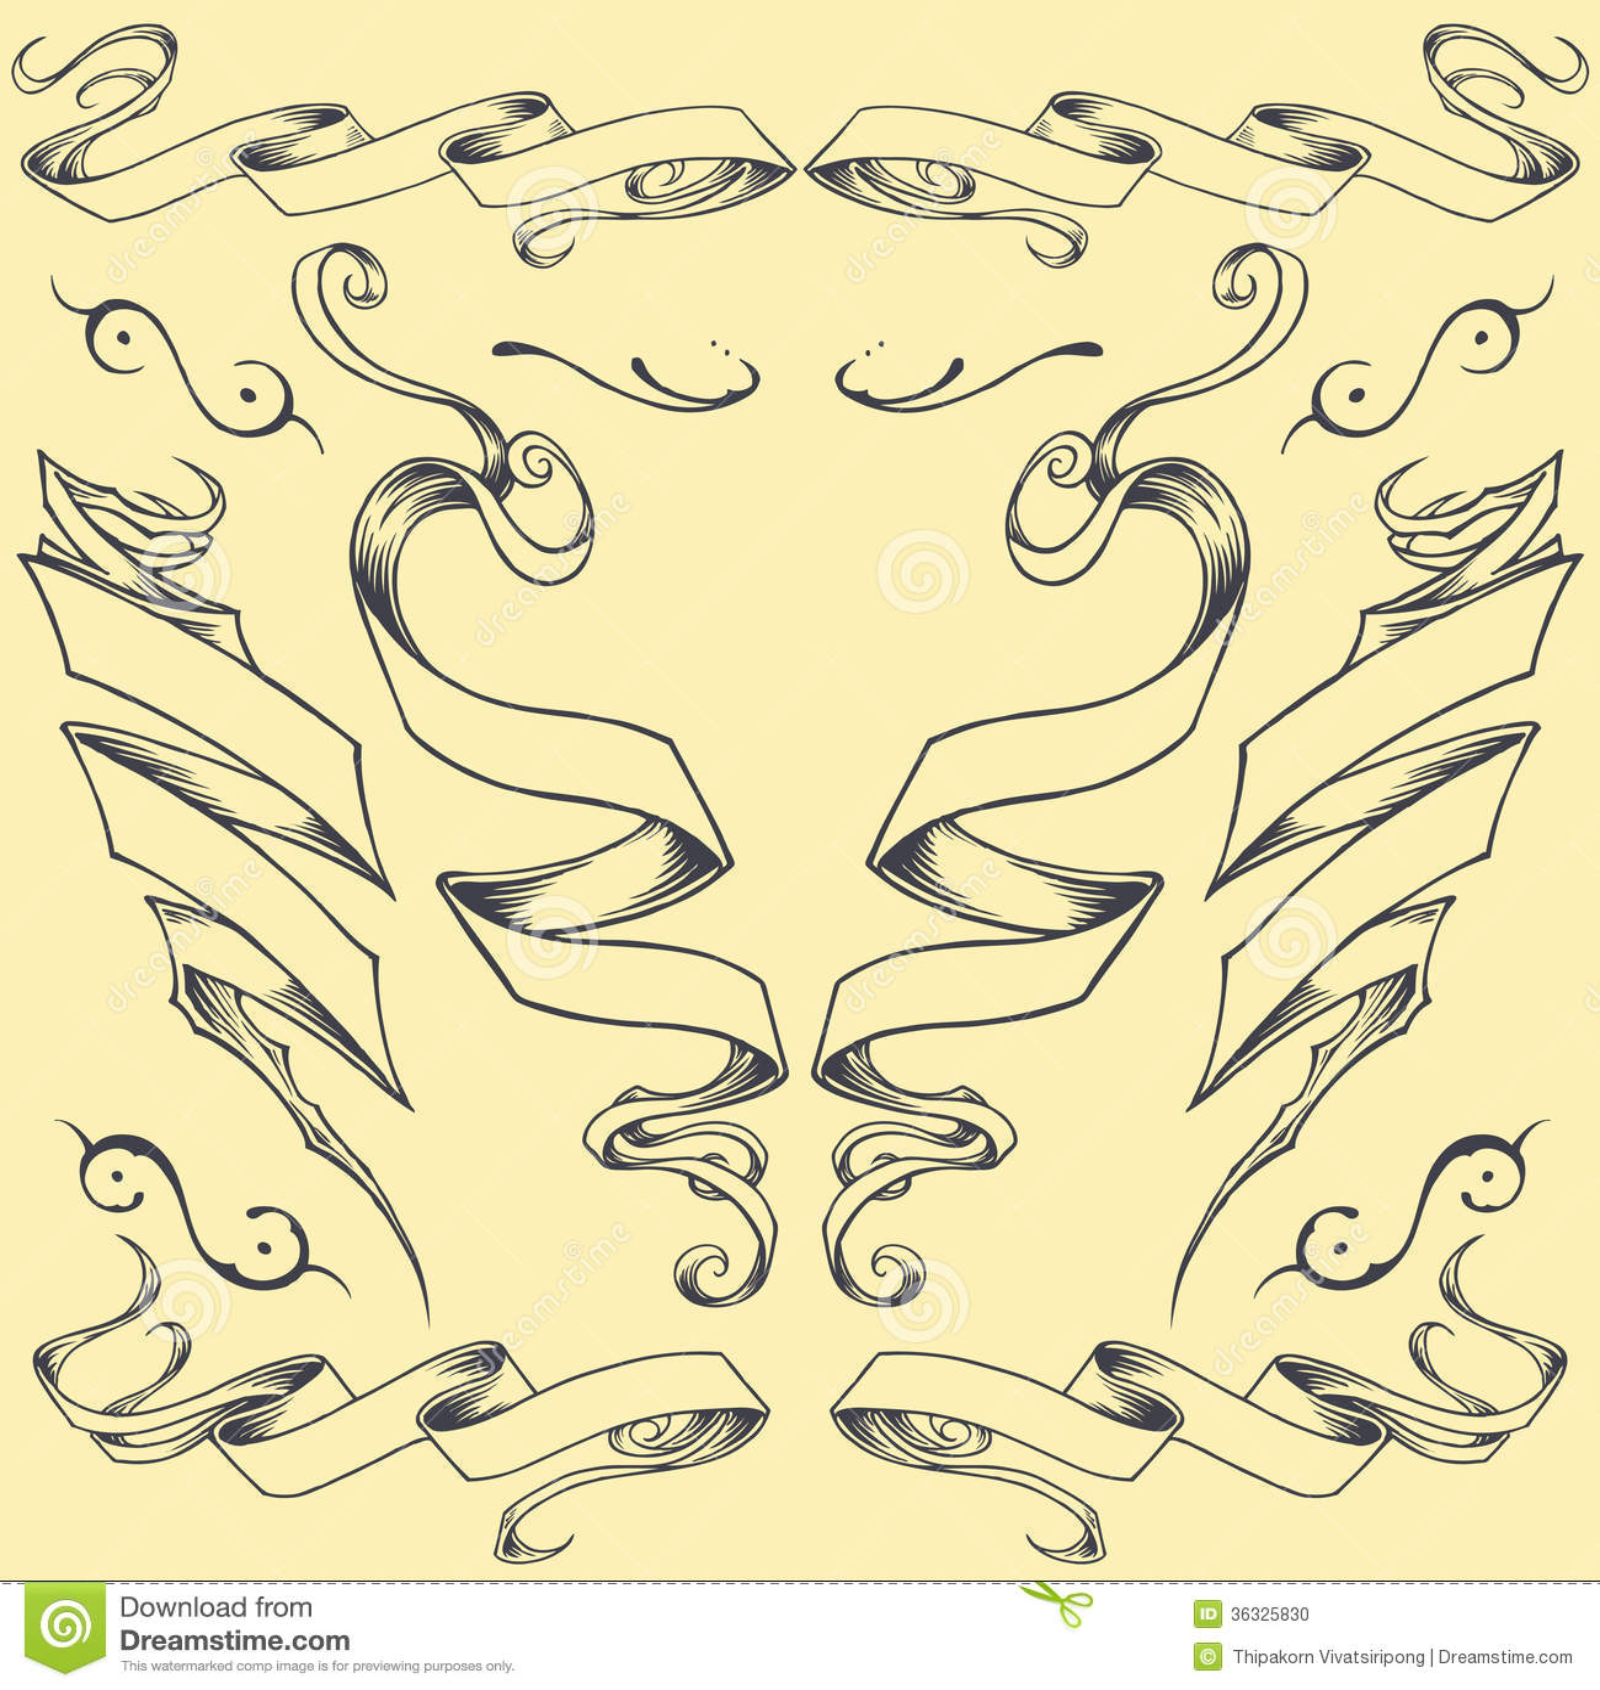 ribbons set 02 stock photo image 36325830. Black Bedroom Furniture Sets. Home Design Ideas